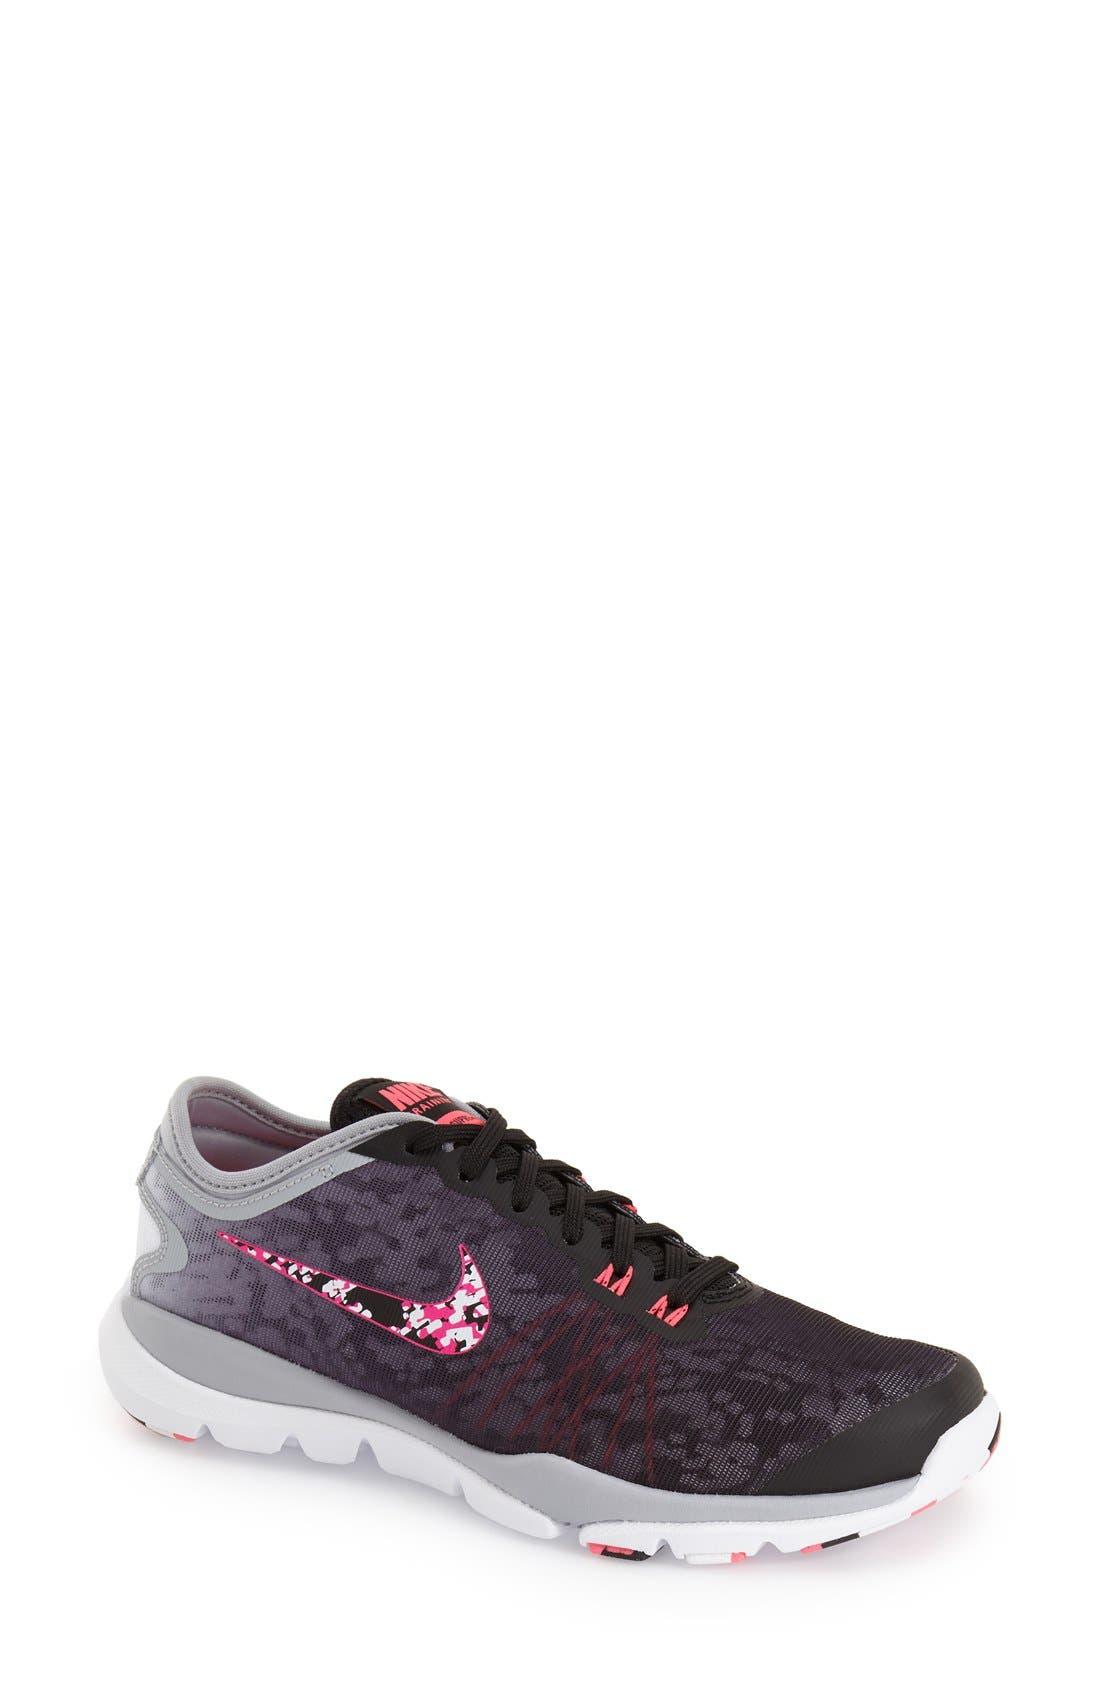 Alternate Image 1 Selected - Nike 'Flex Supreme' Training Shoe (Women)